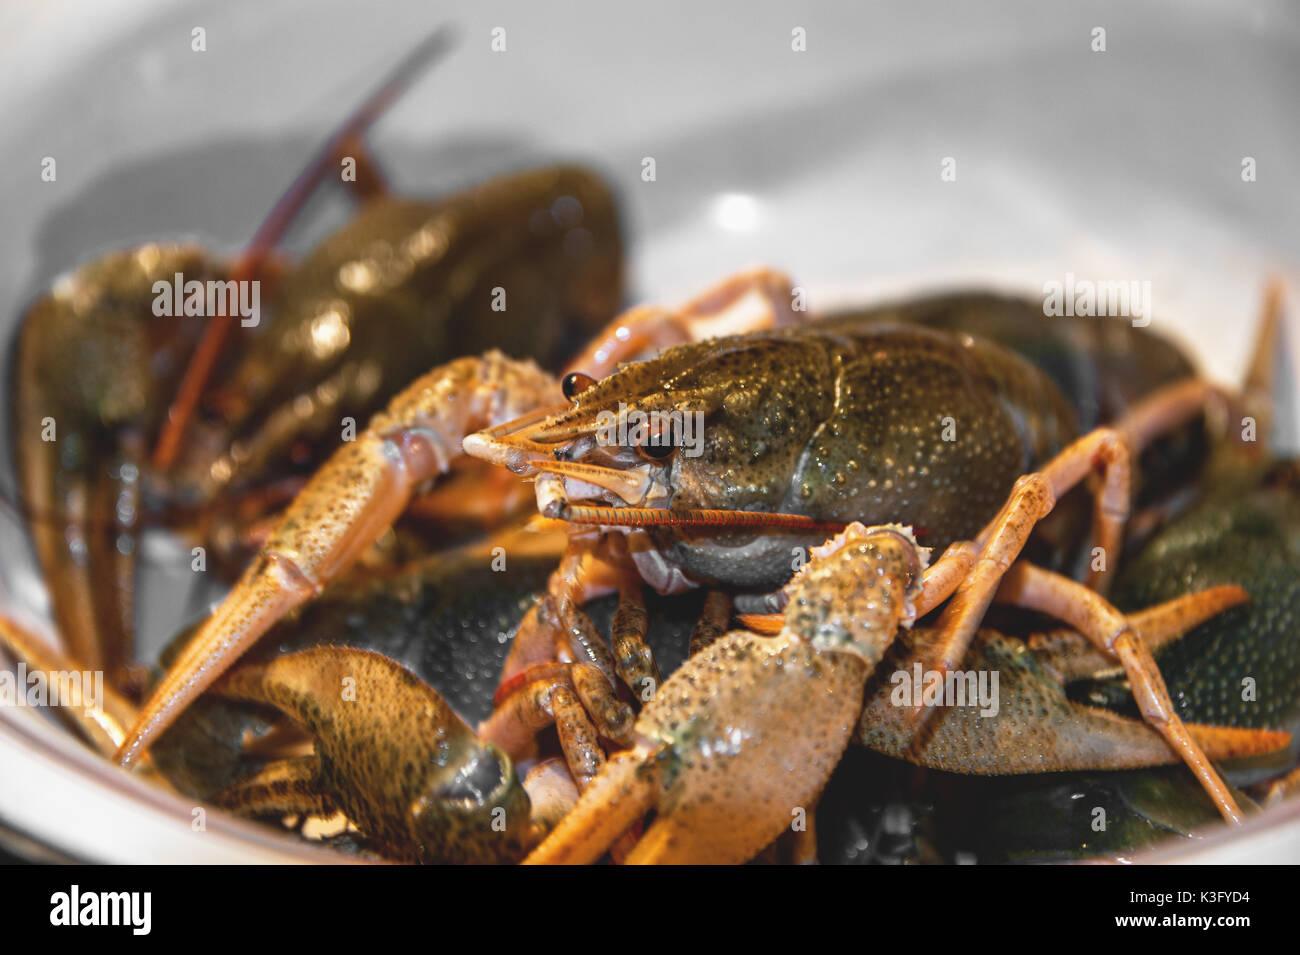 Live green Flusskrebse auf einem großen Teller vor dem Kochen. Close-up. Stockbild